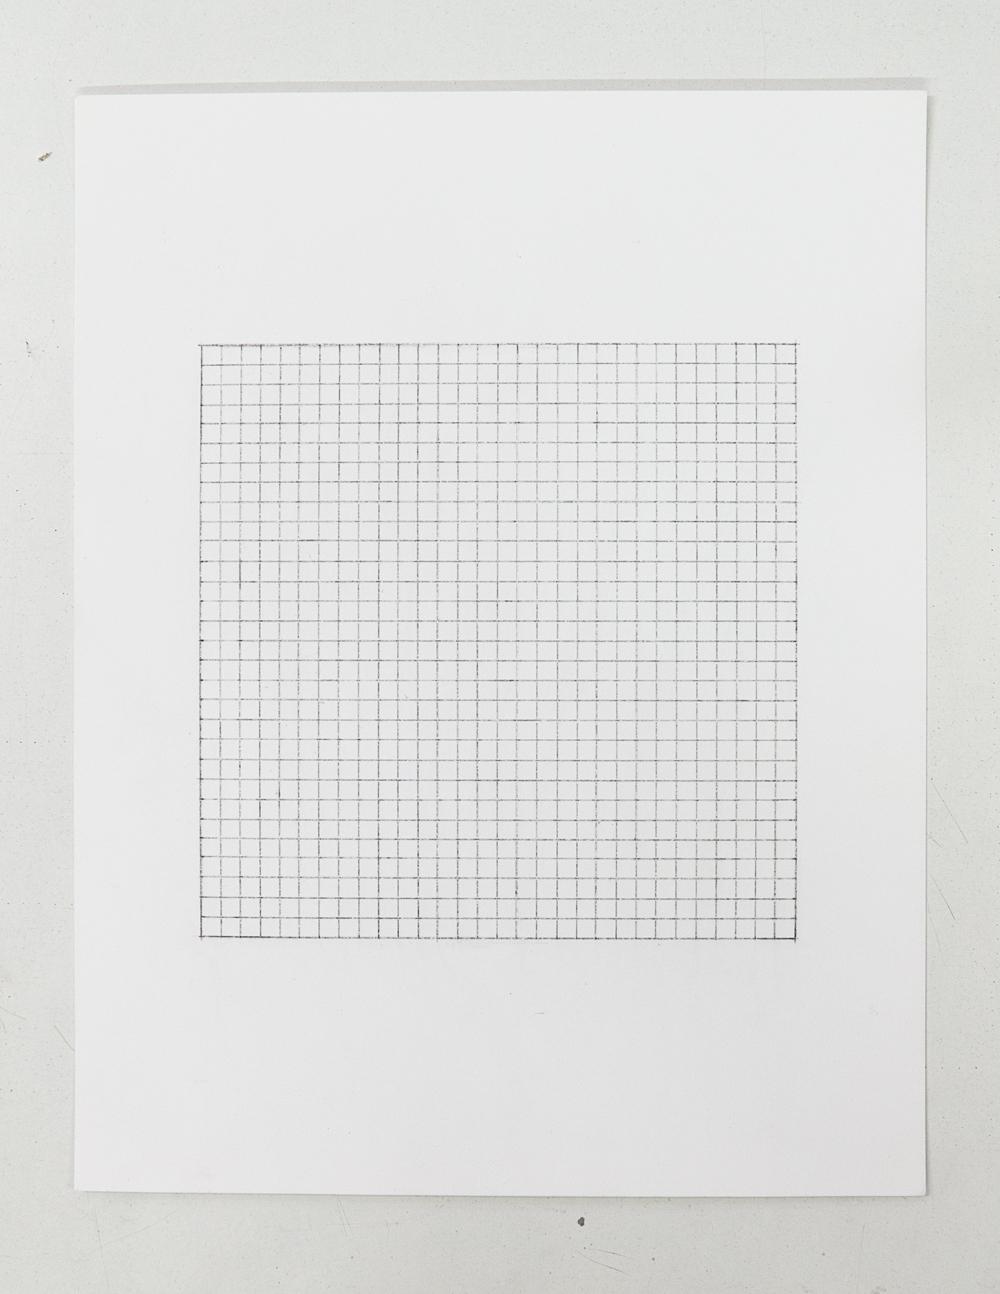 (PRISONTIME/PRISONINME: Transition to Metric)   5mm x 5mm on 15cm x 15cm  ,2014   Pencil on semi-matte inkjet fiber paper, 8.5 in.x 11 in.